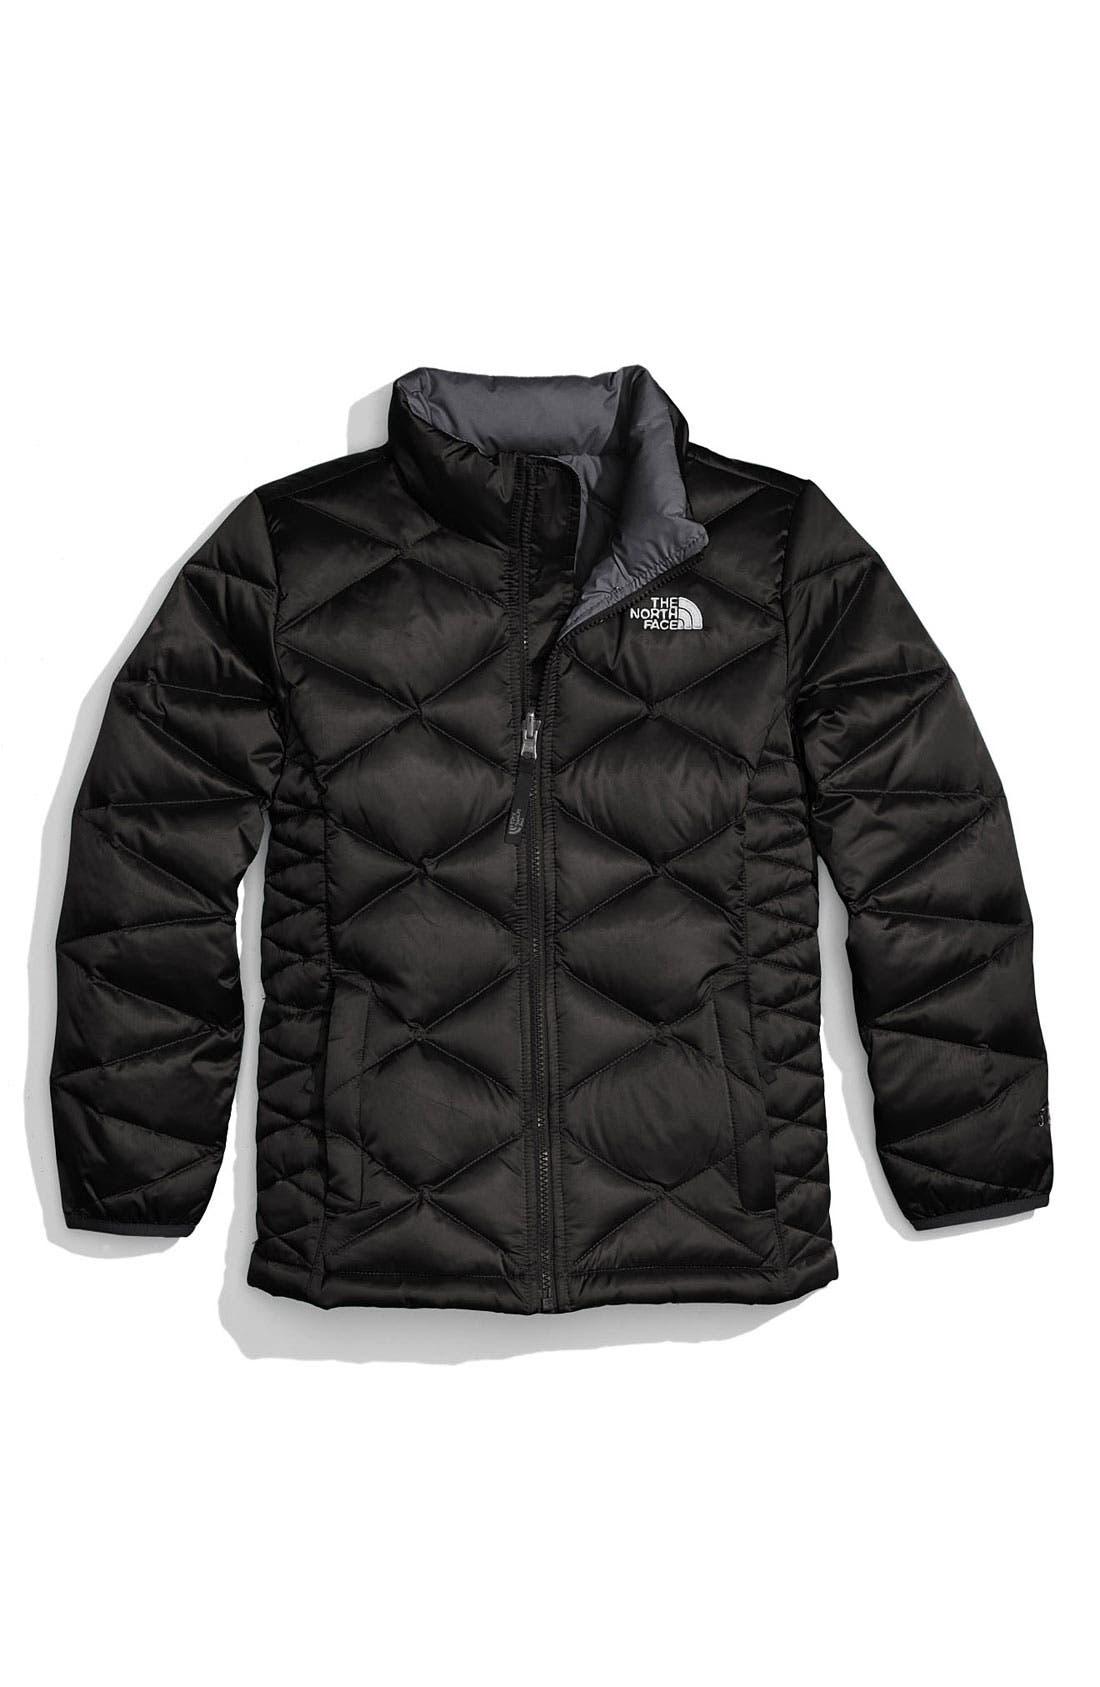 Main Image - The North Face 'Aconcagua' Jacket (Big Girls)